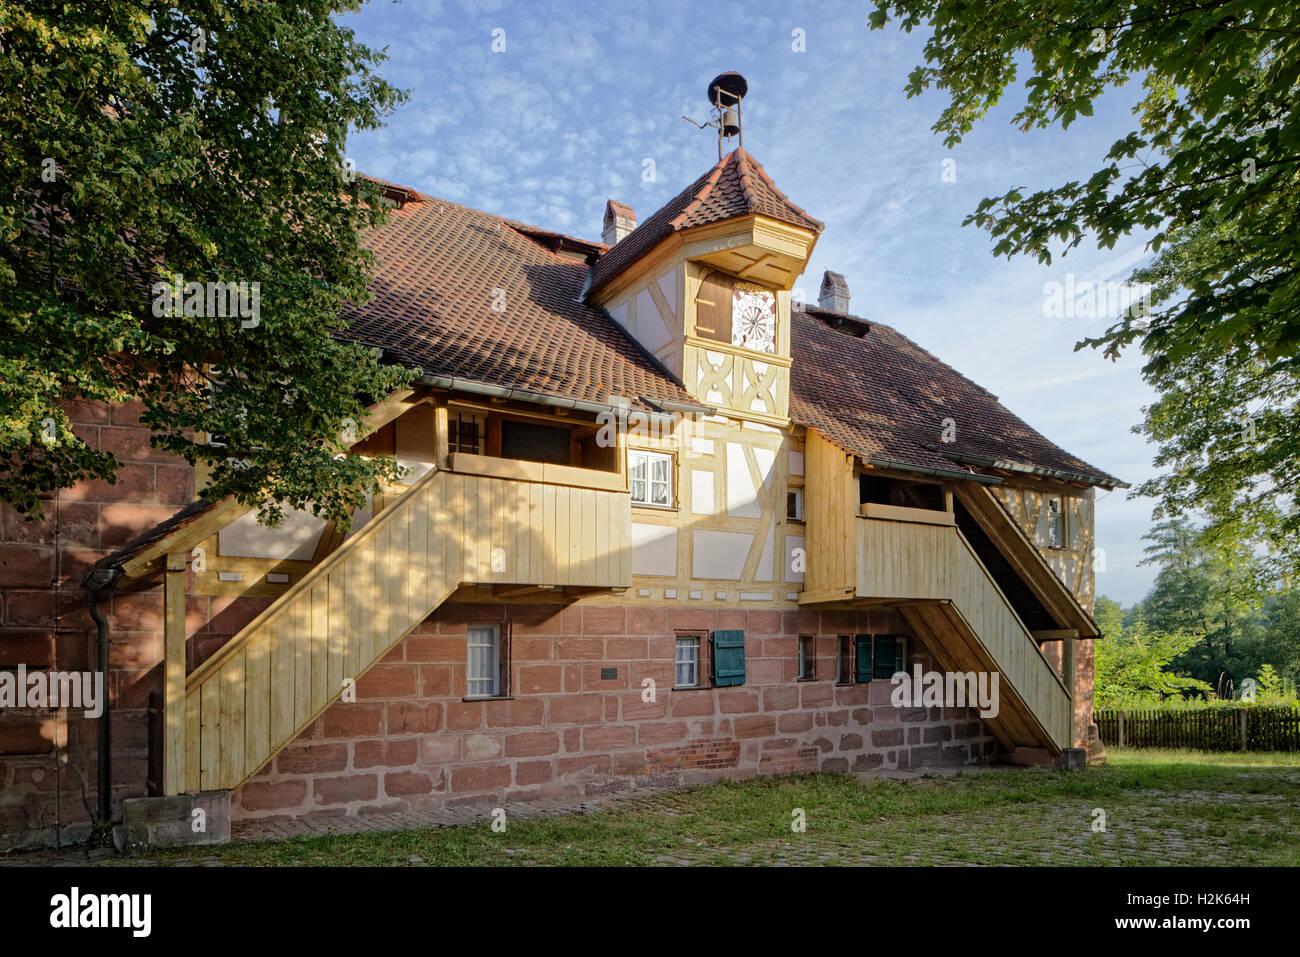 Watch House, historische Fabrik Hammer, Laufamholz, Nürnberg, Middle Franconia, Franken, Bayern, Deutschland Stockbild